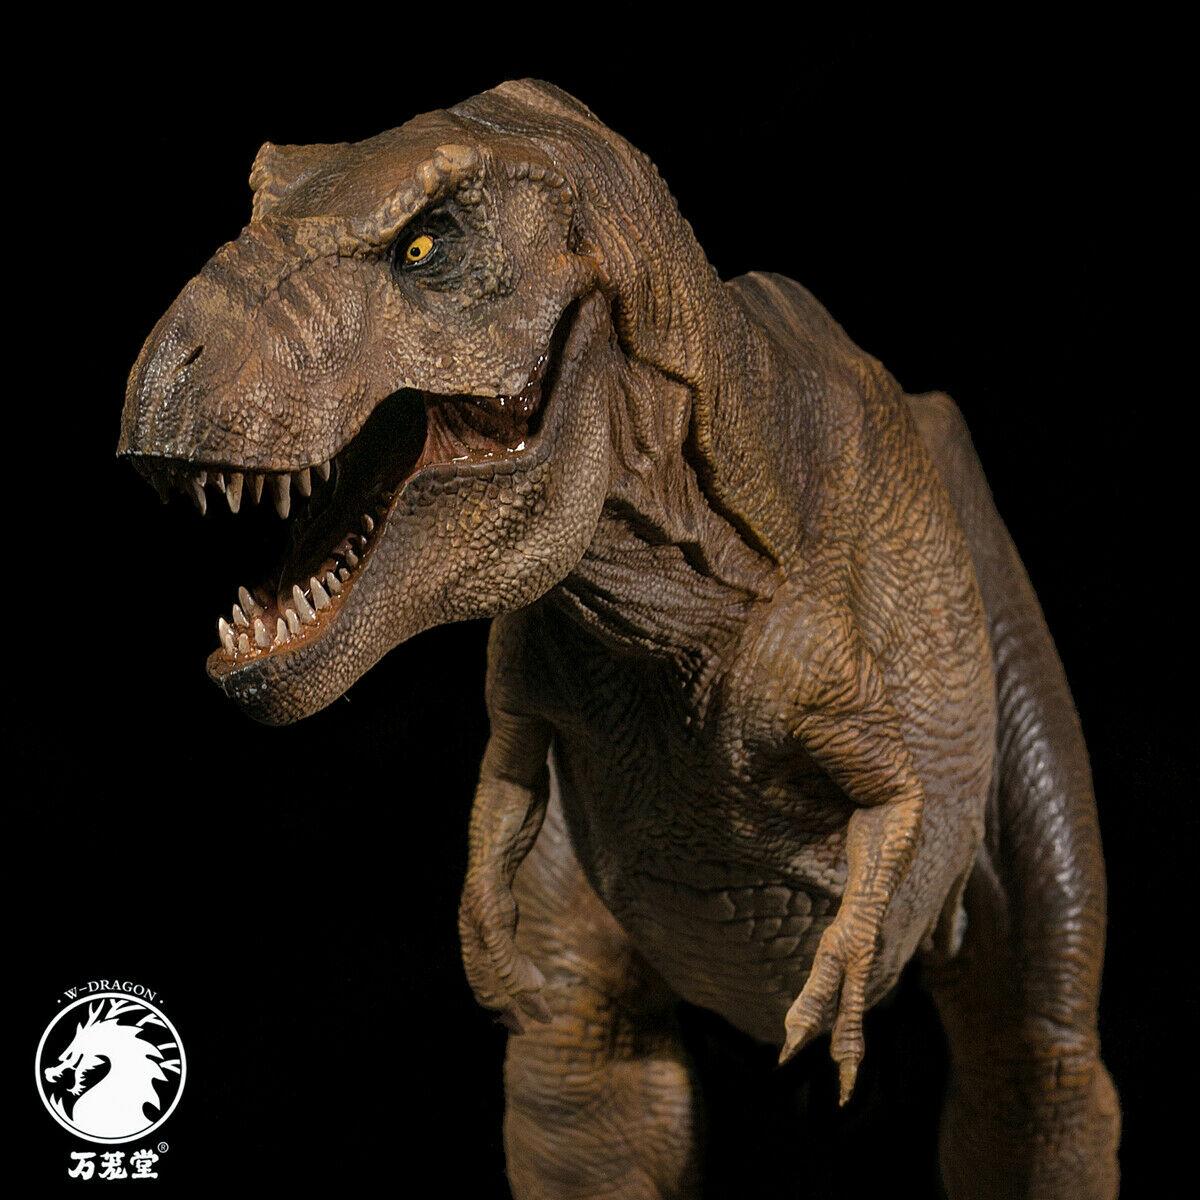 W-Dragon Allosaurus Figure Statue Dinosaur Model Animal Collector Gift Toy Dinos